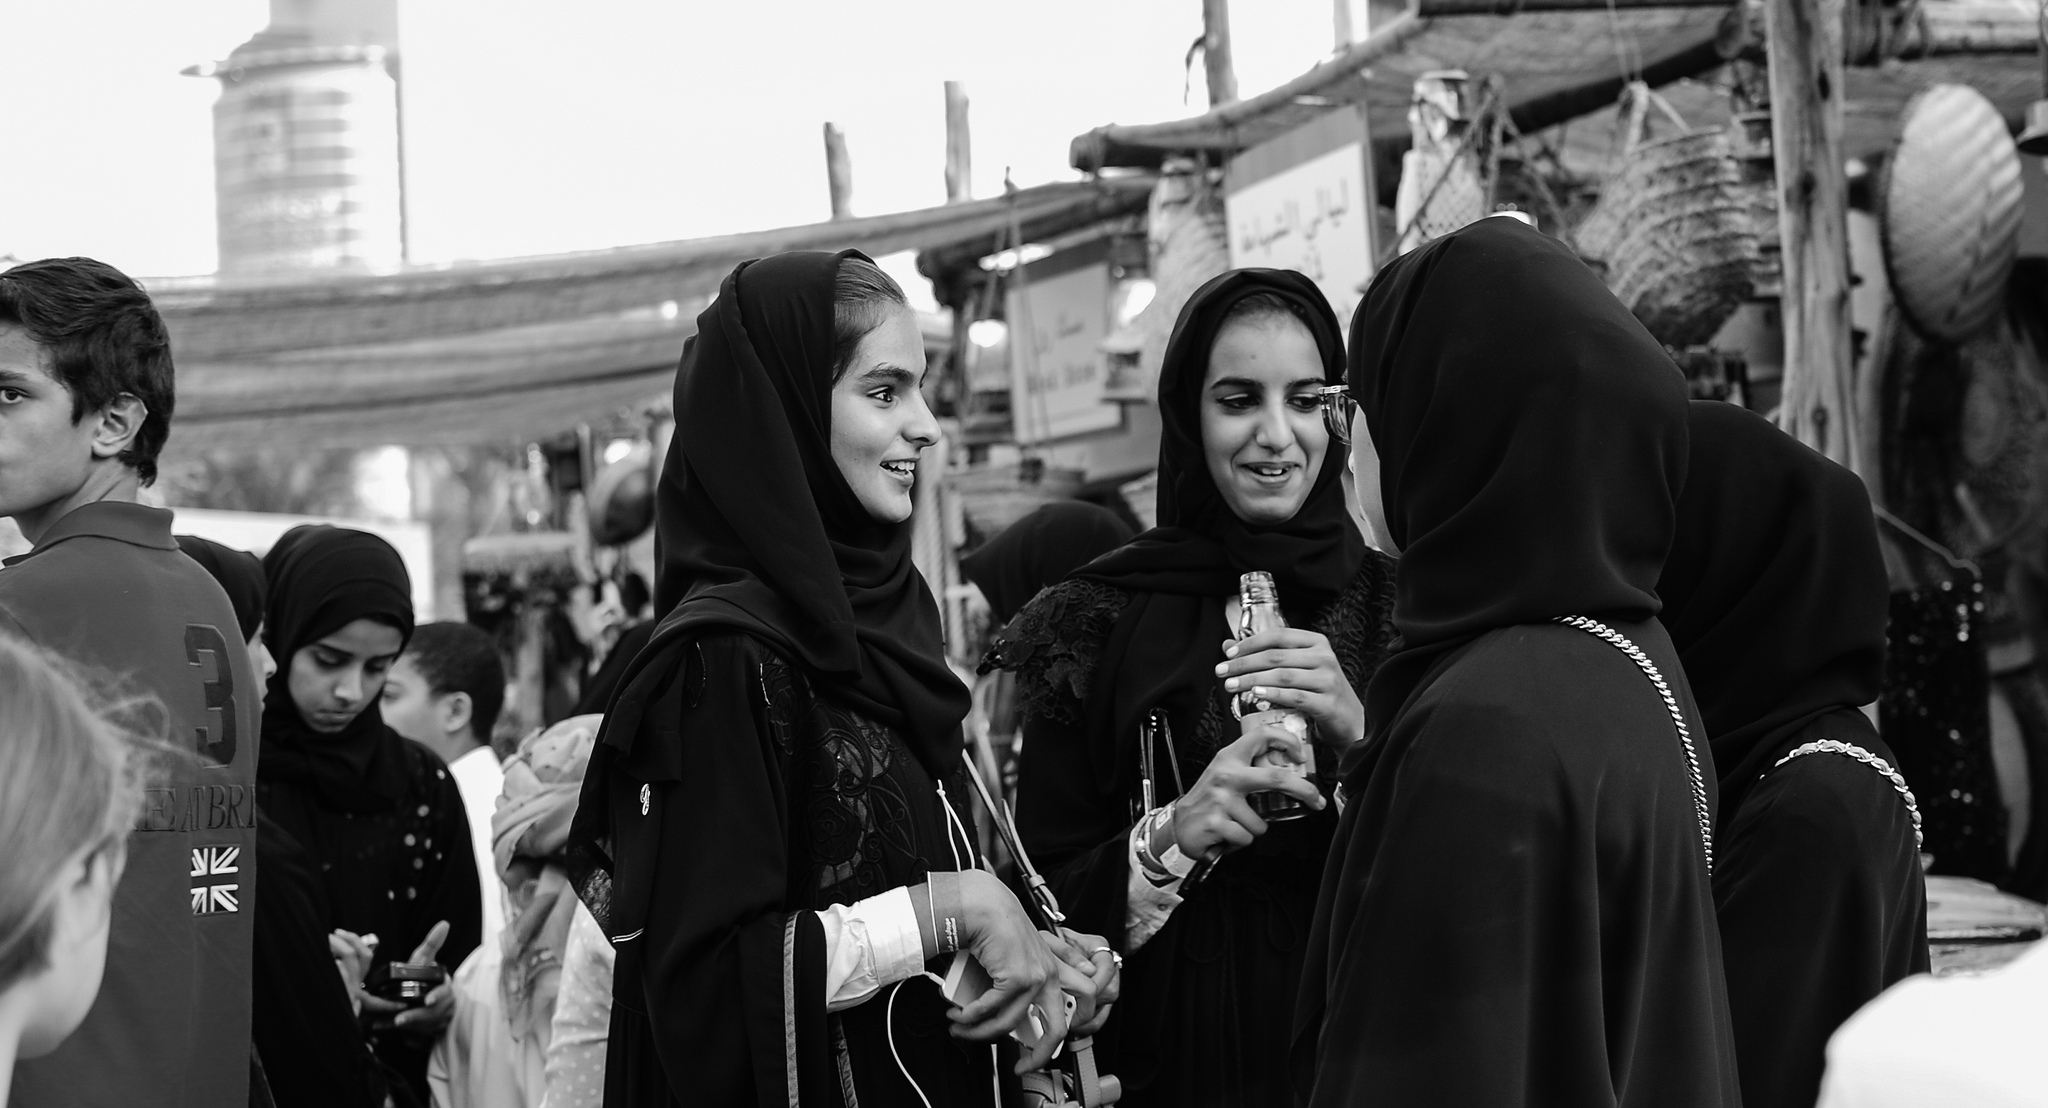 Фестиваль Каср аль-Хосн в Абу-Даби